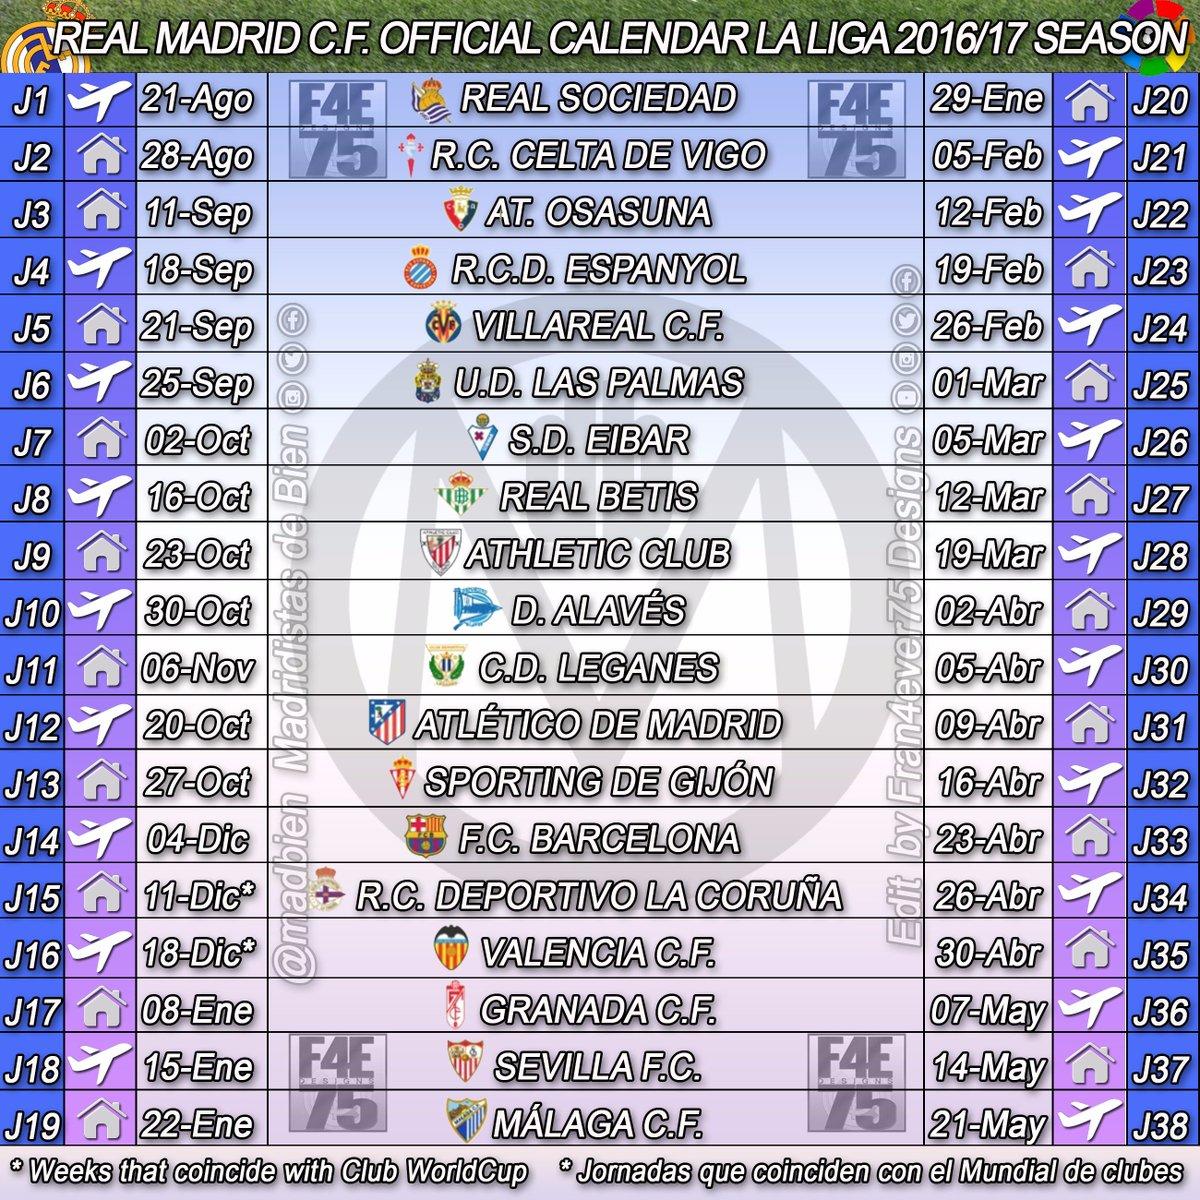 Real Madrid Calendario.Fran4ever75 Designs C On Twitter Calendario Oficial Del